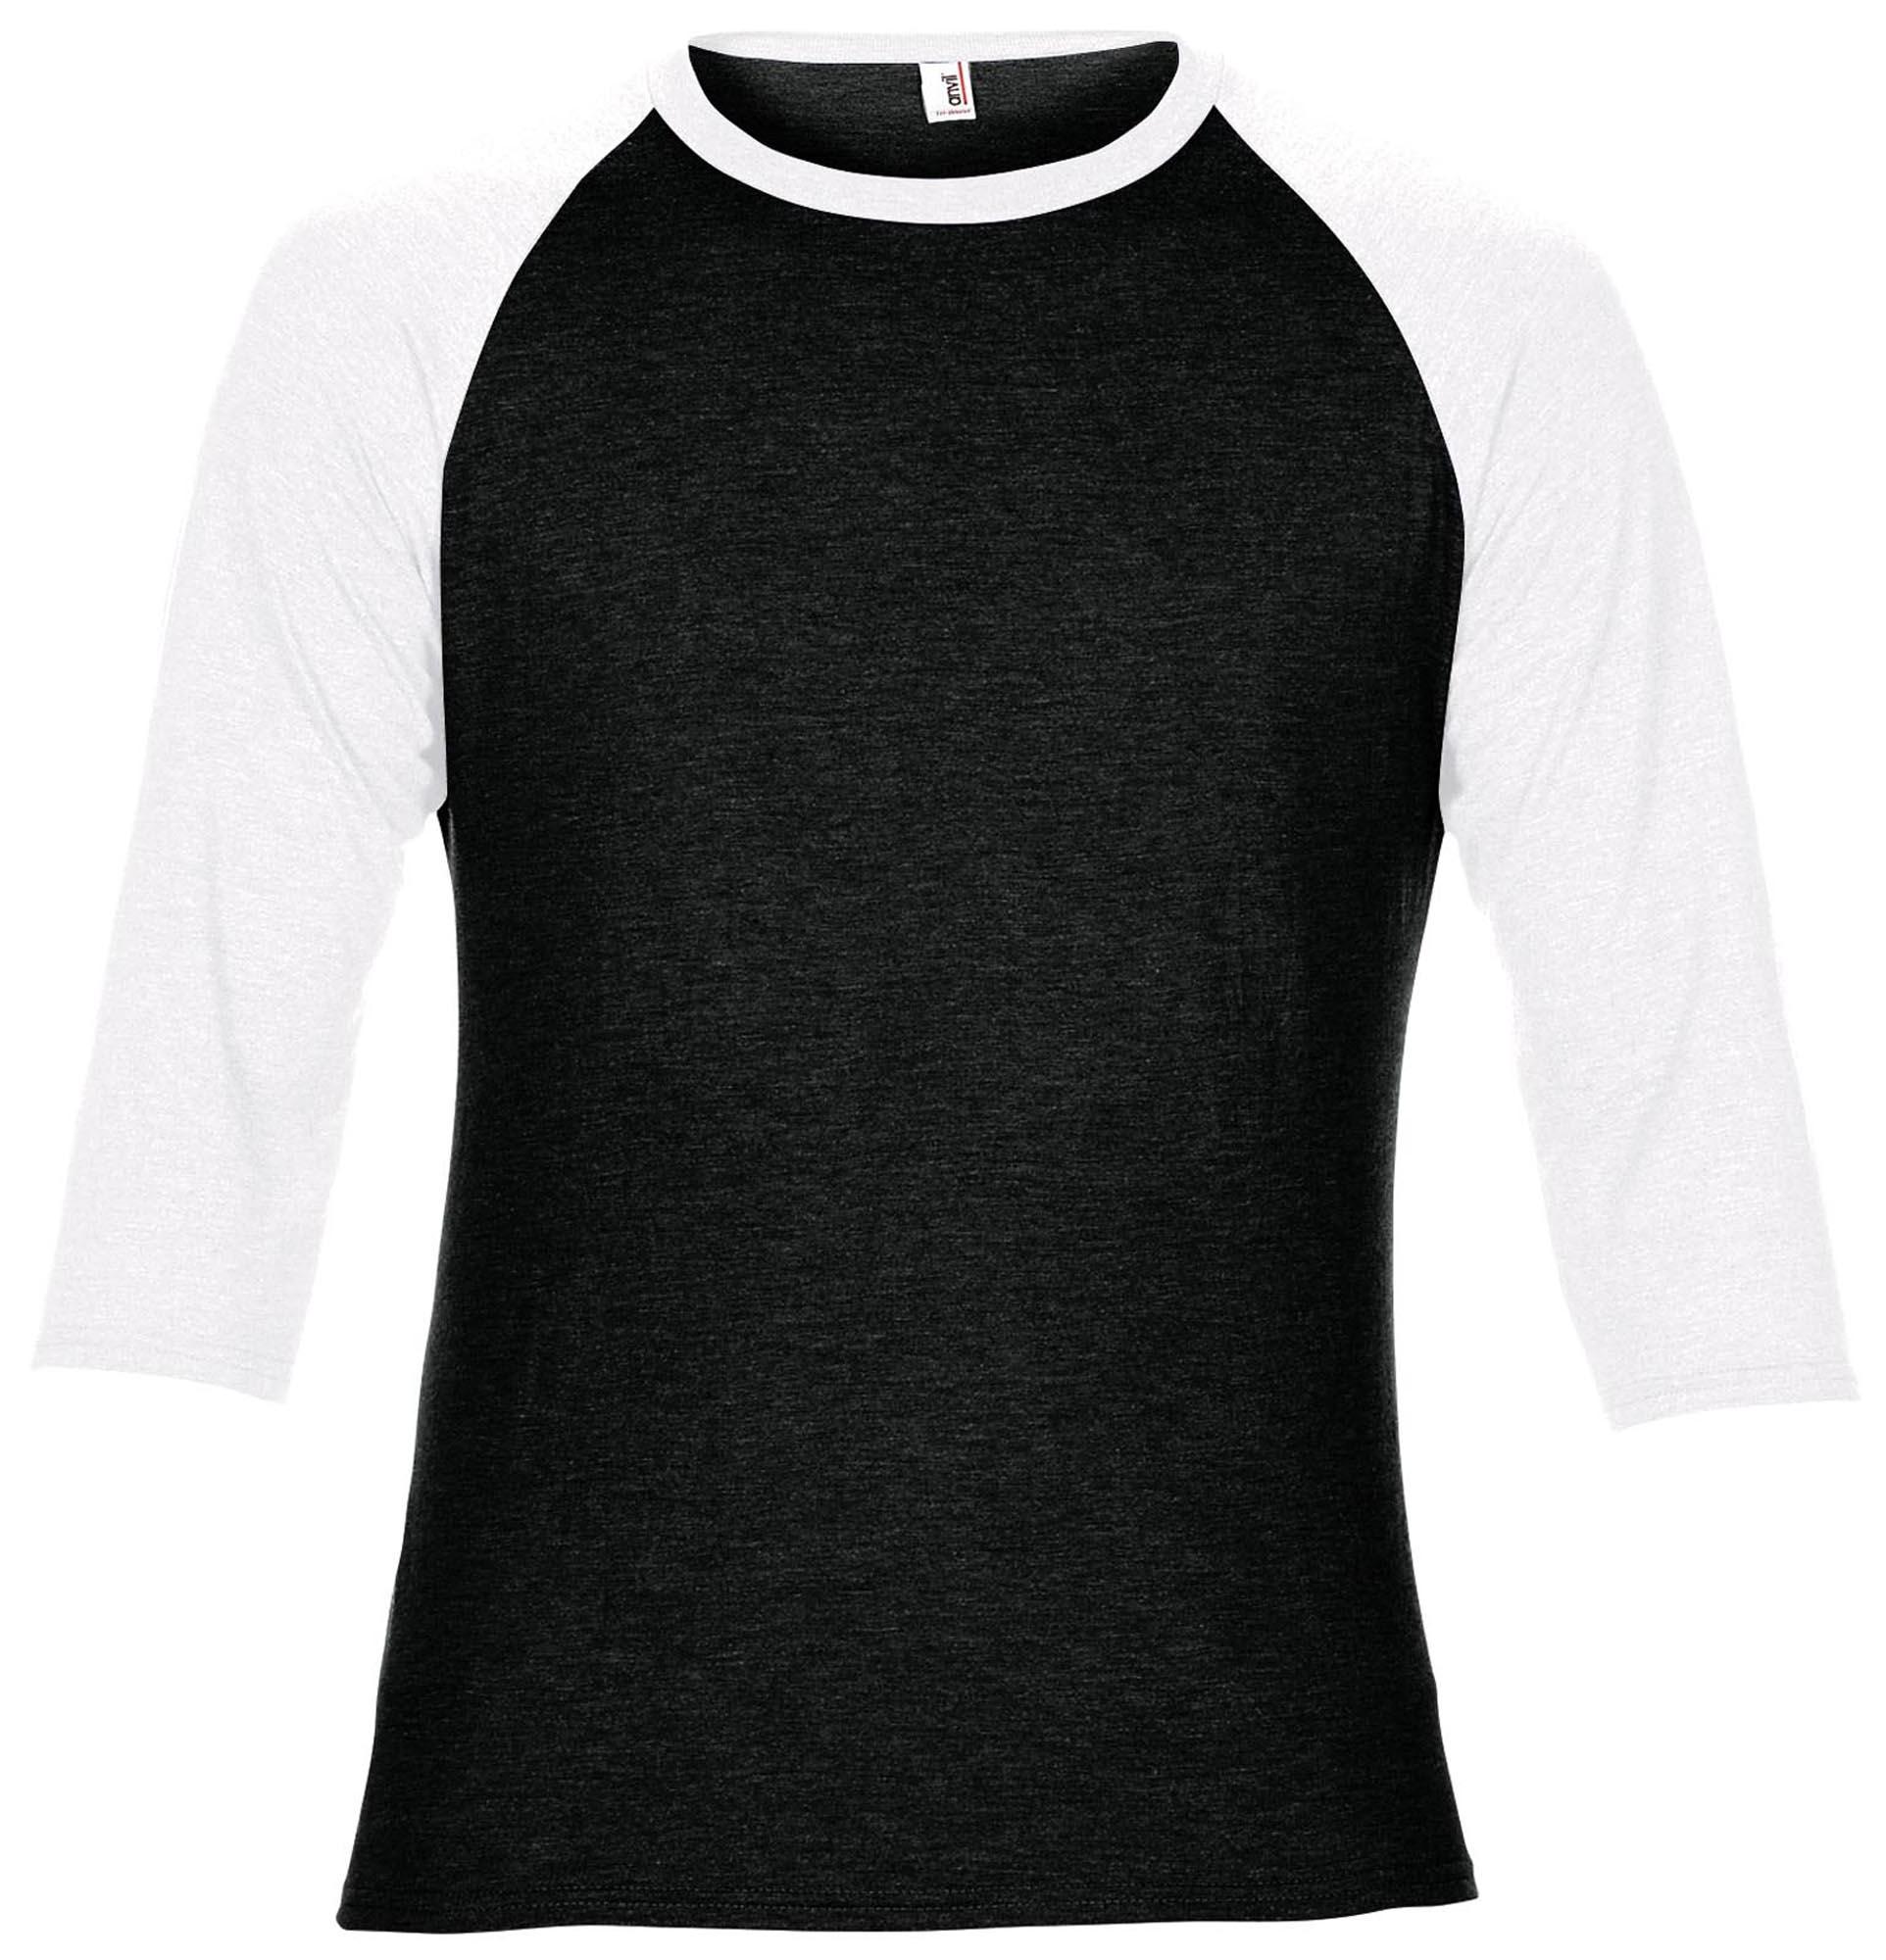 Anvil AV114 Adulti Triblend 3//4 Sleeve Raglan Tee in bianco pianura-shirt grala AV114